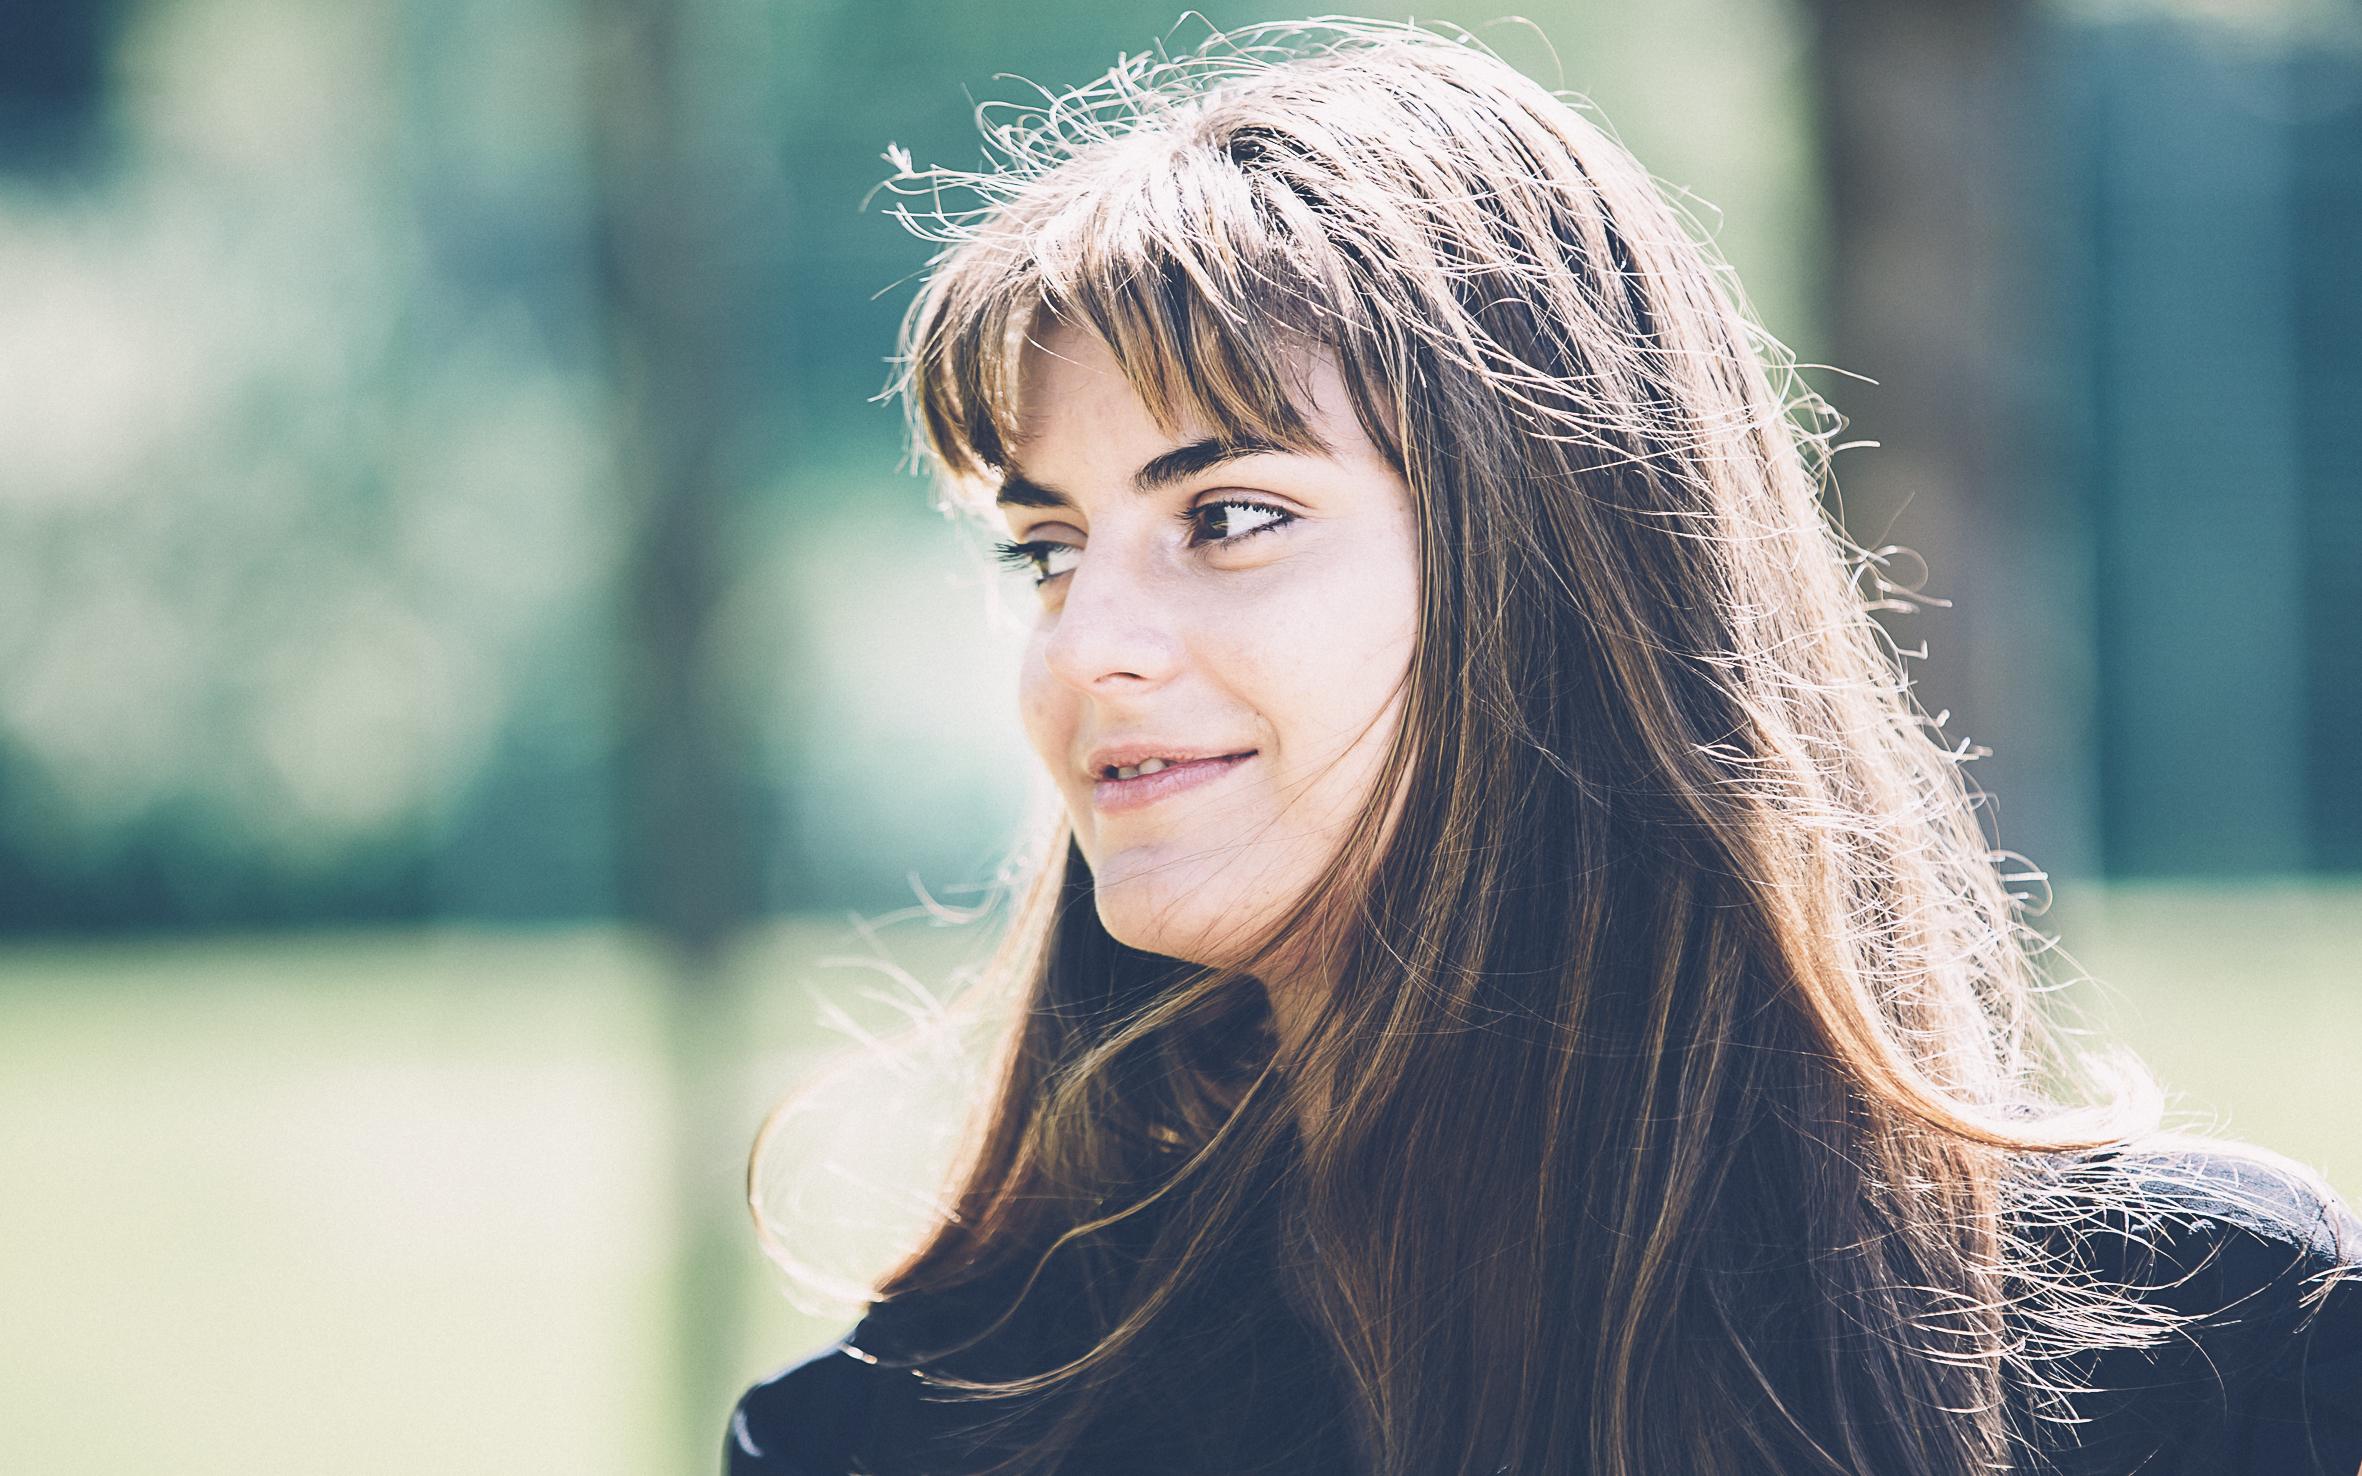 Lana Berakovic (c) Marija Kanižaj